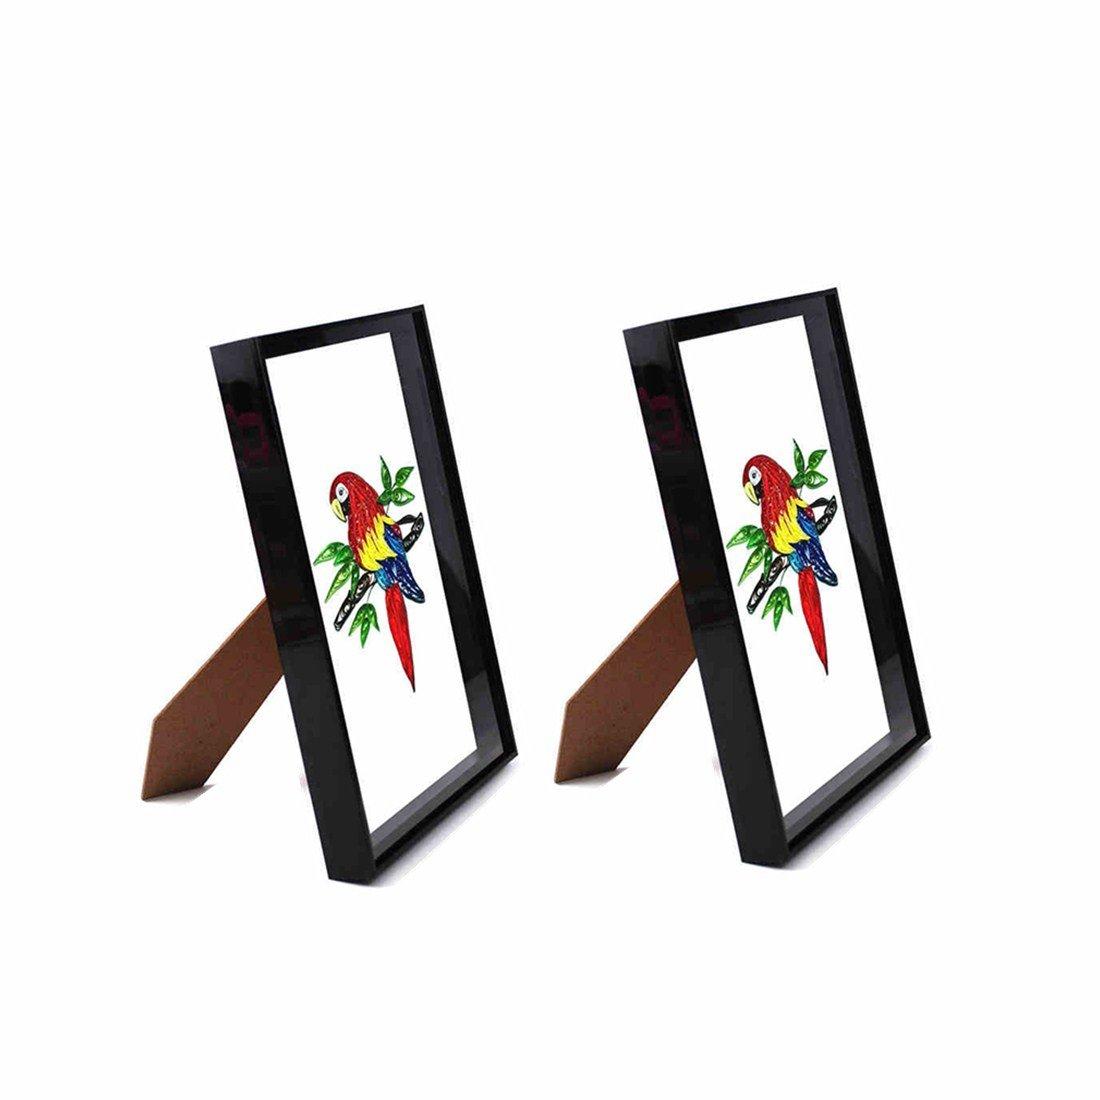 YURROAD A4 Photo Frame for Paper Quilling Crafts Handmade Artworks Display on Desktop or Hang (Black,2 Pack) ...